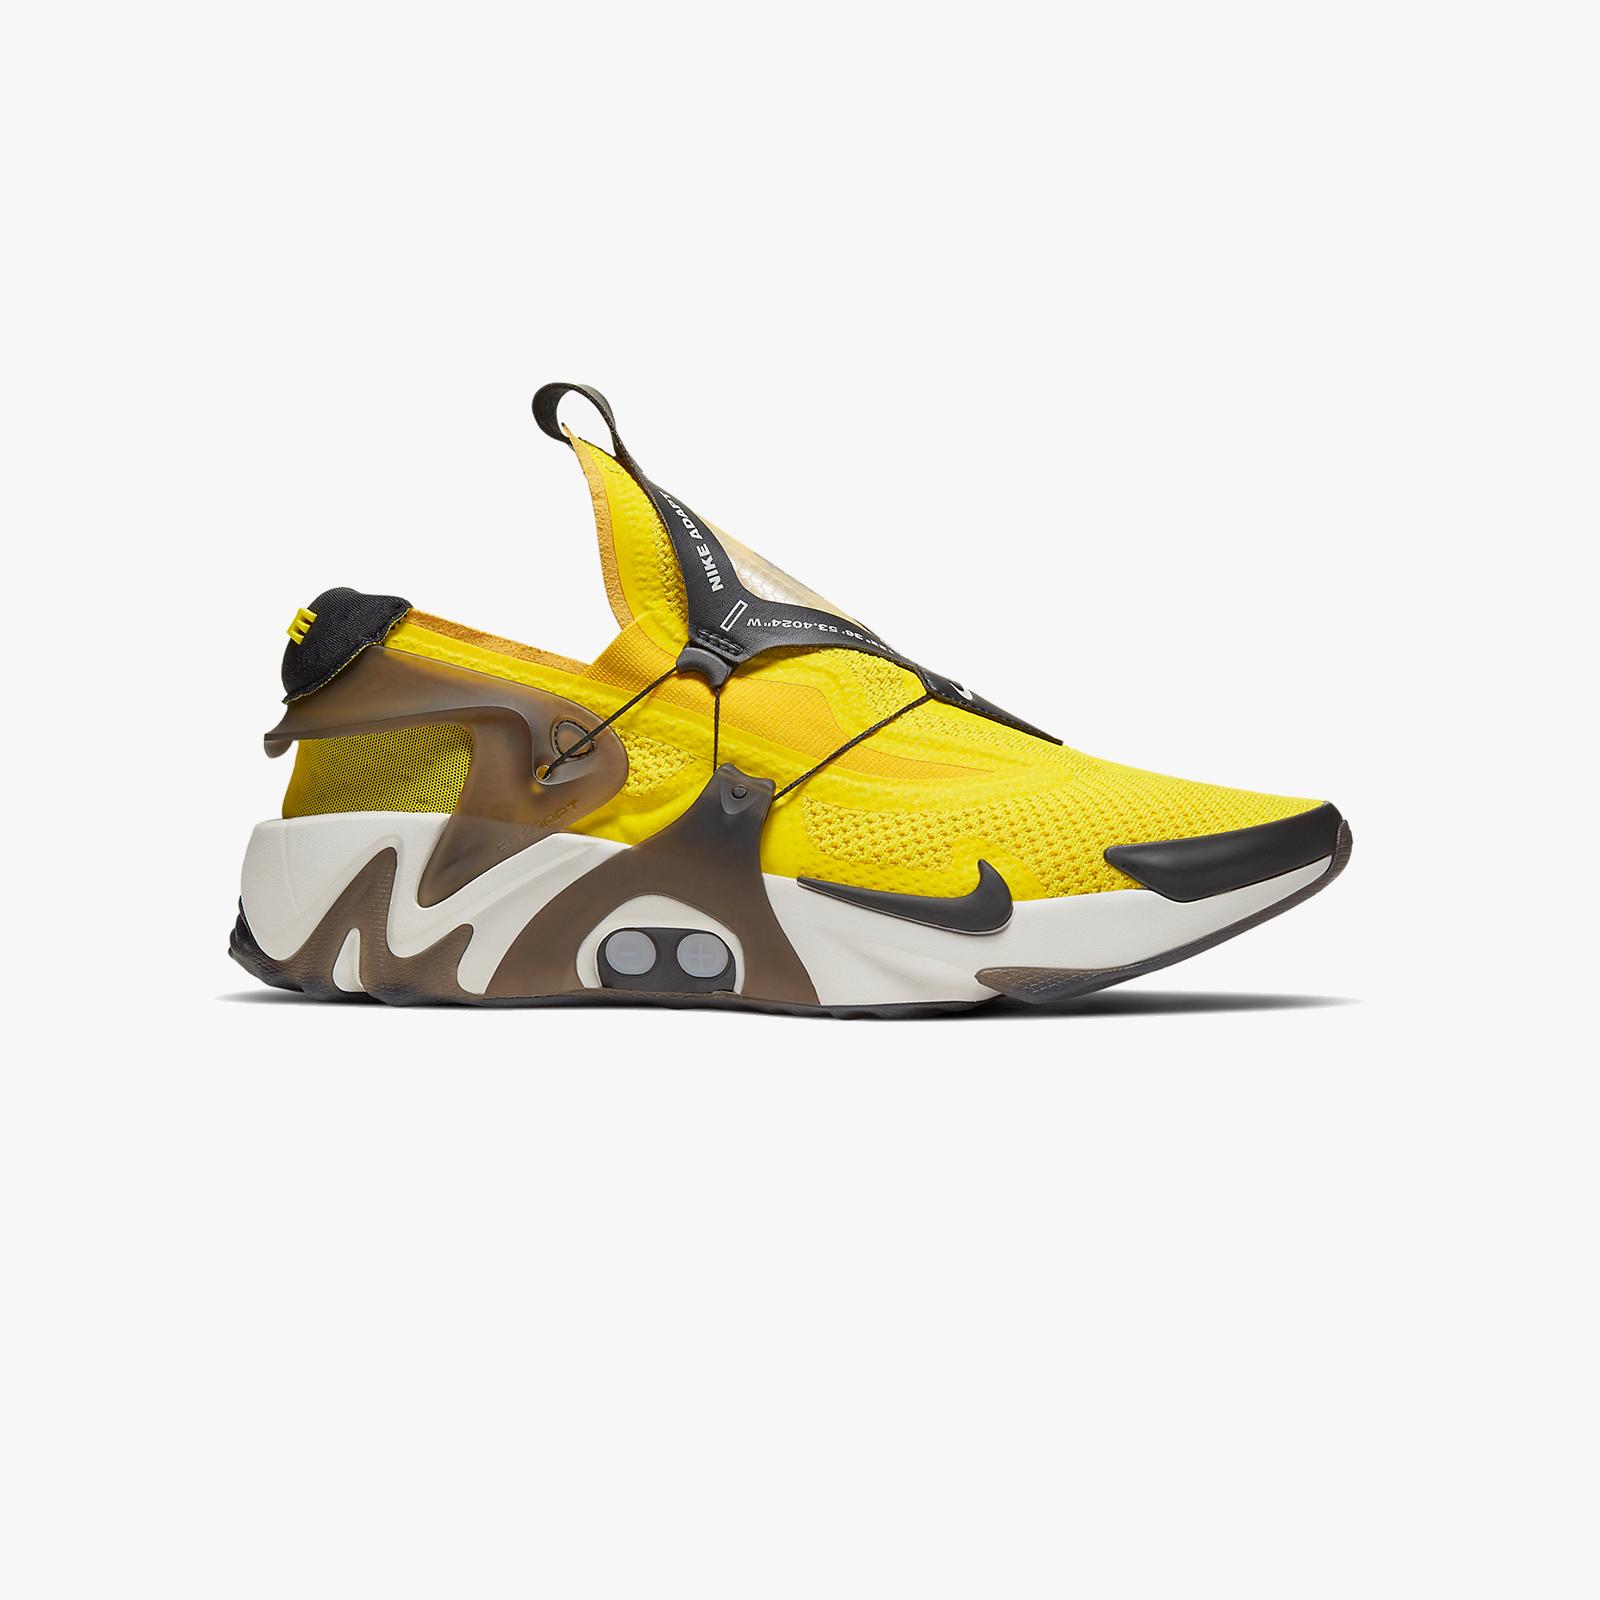 Nike Adapt Huarache Ct4092 710 Sneakersnstuff I Sneakers